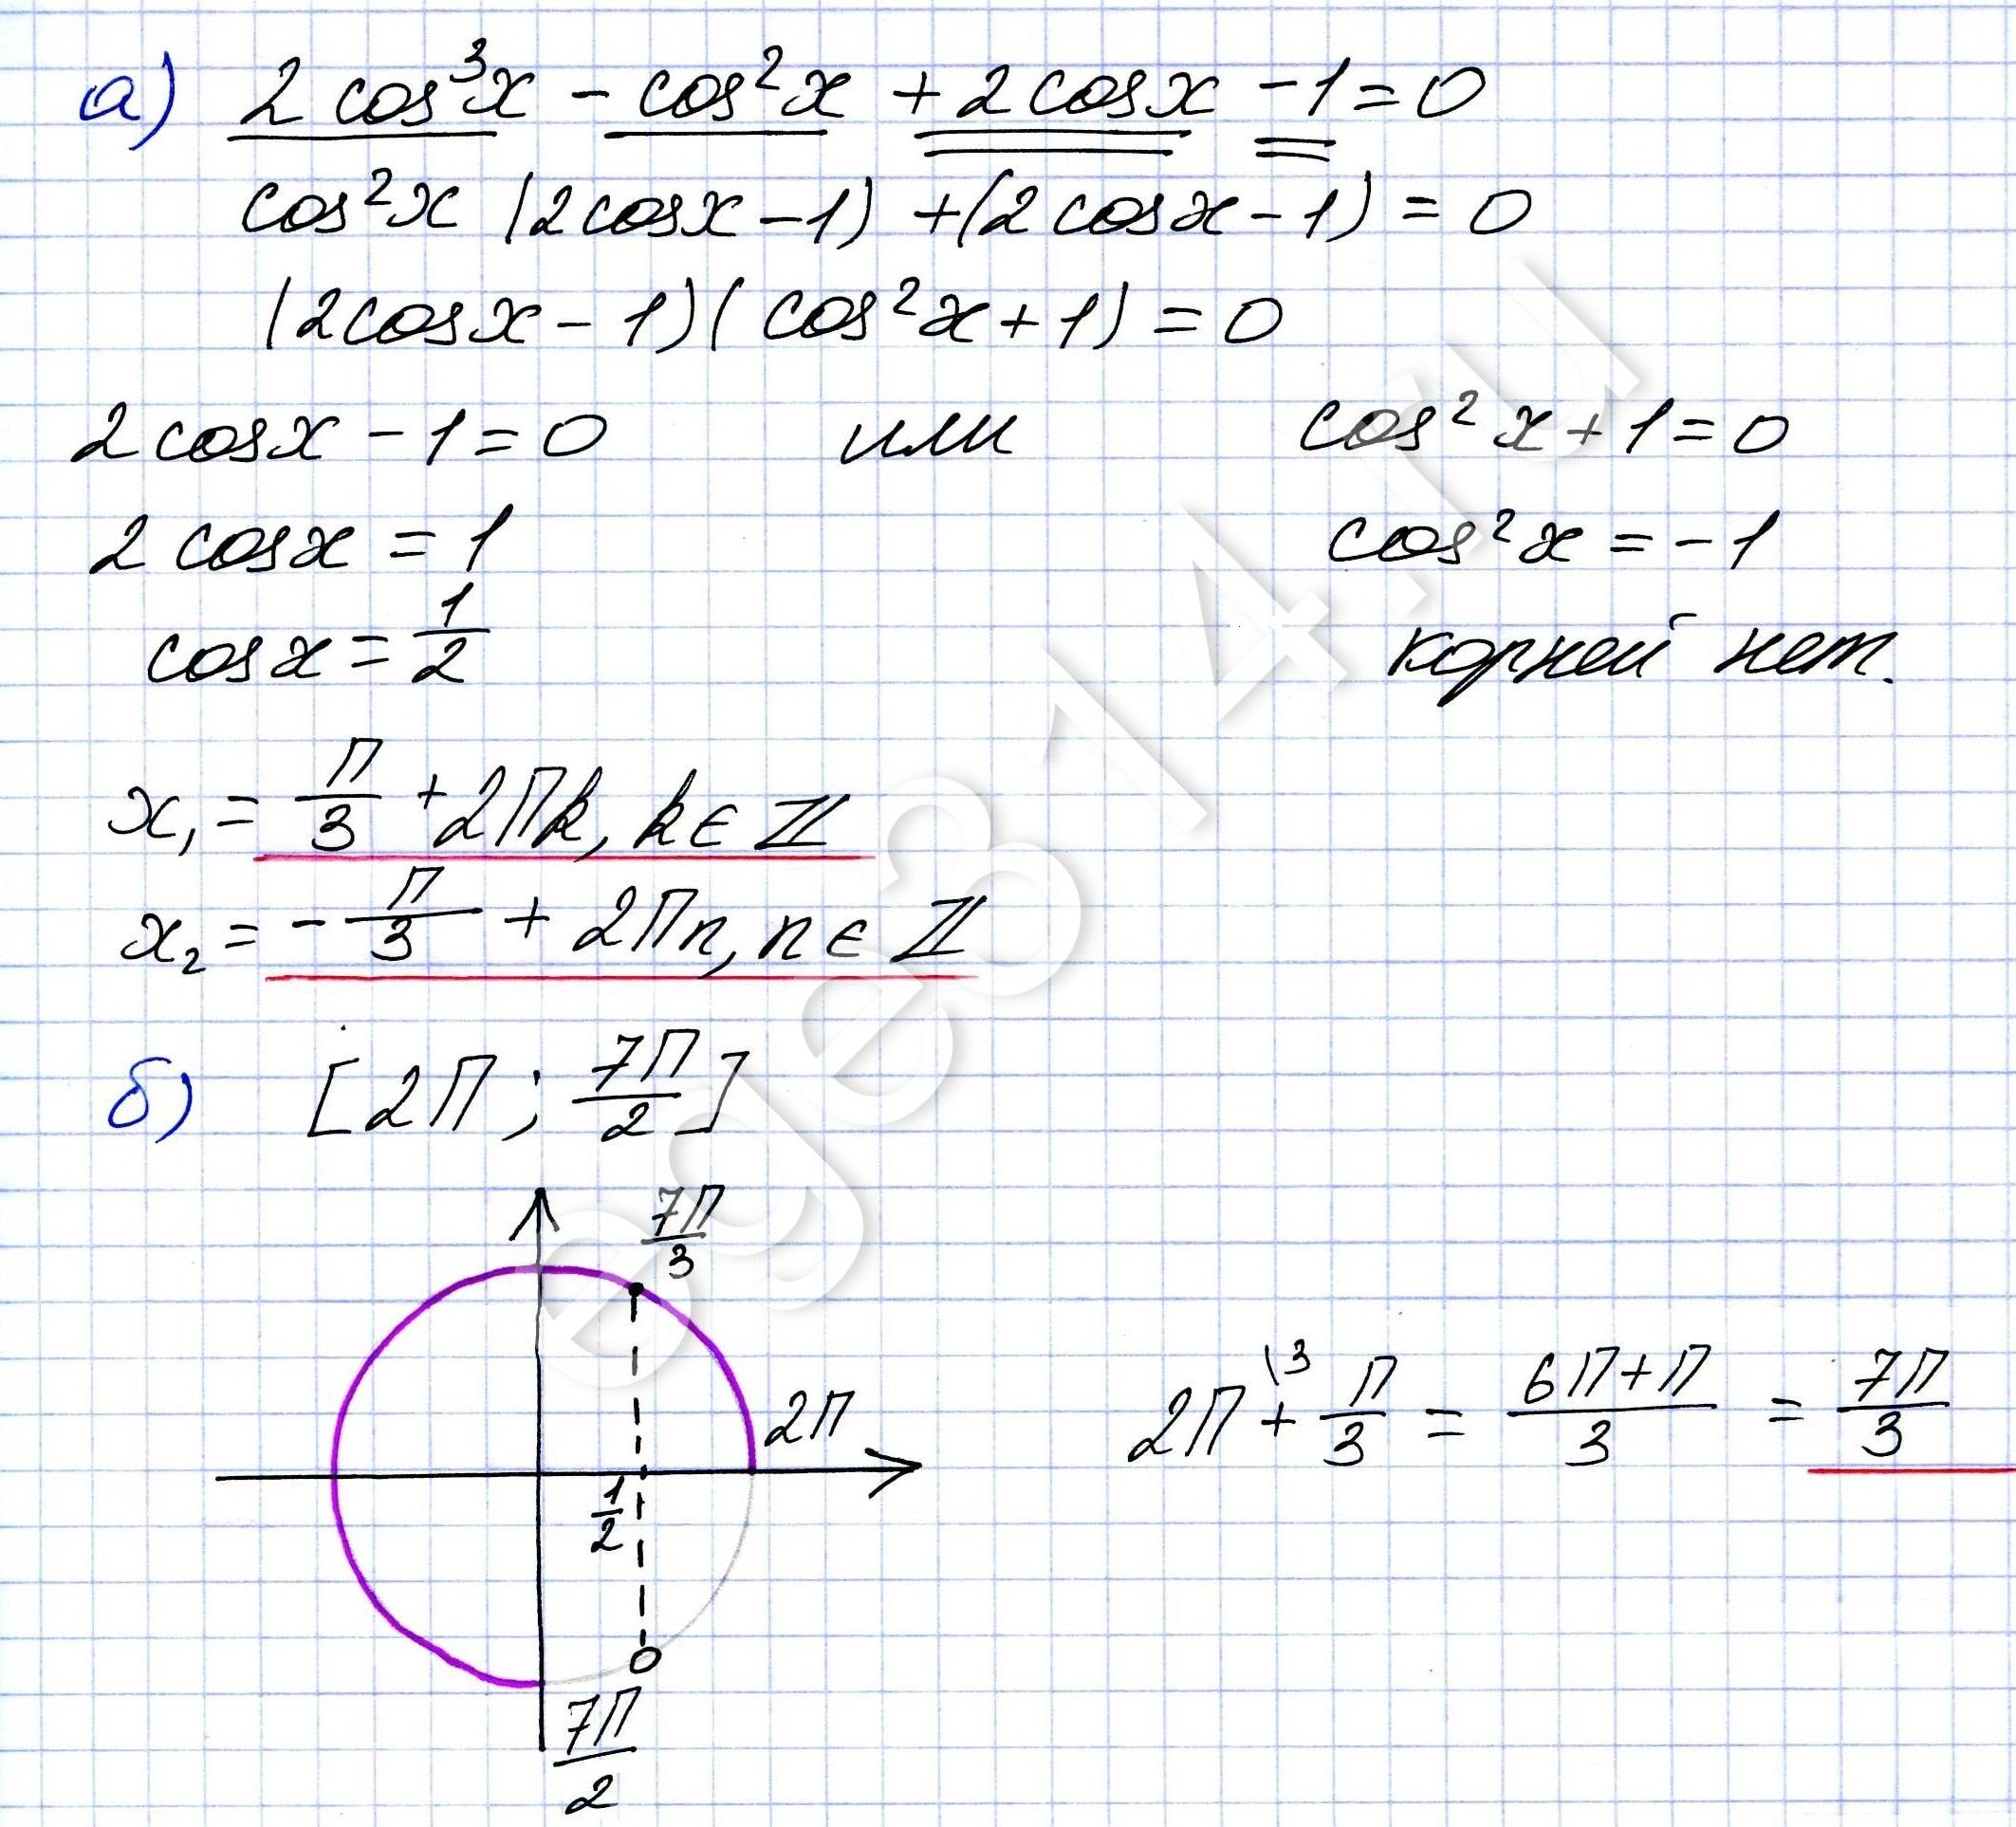 Решите уравнение 2cosx^3-cosx^2+2cosx-1=0